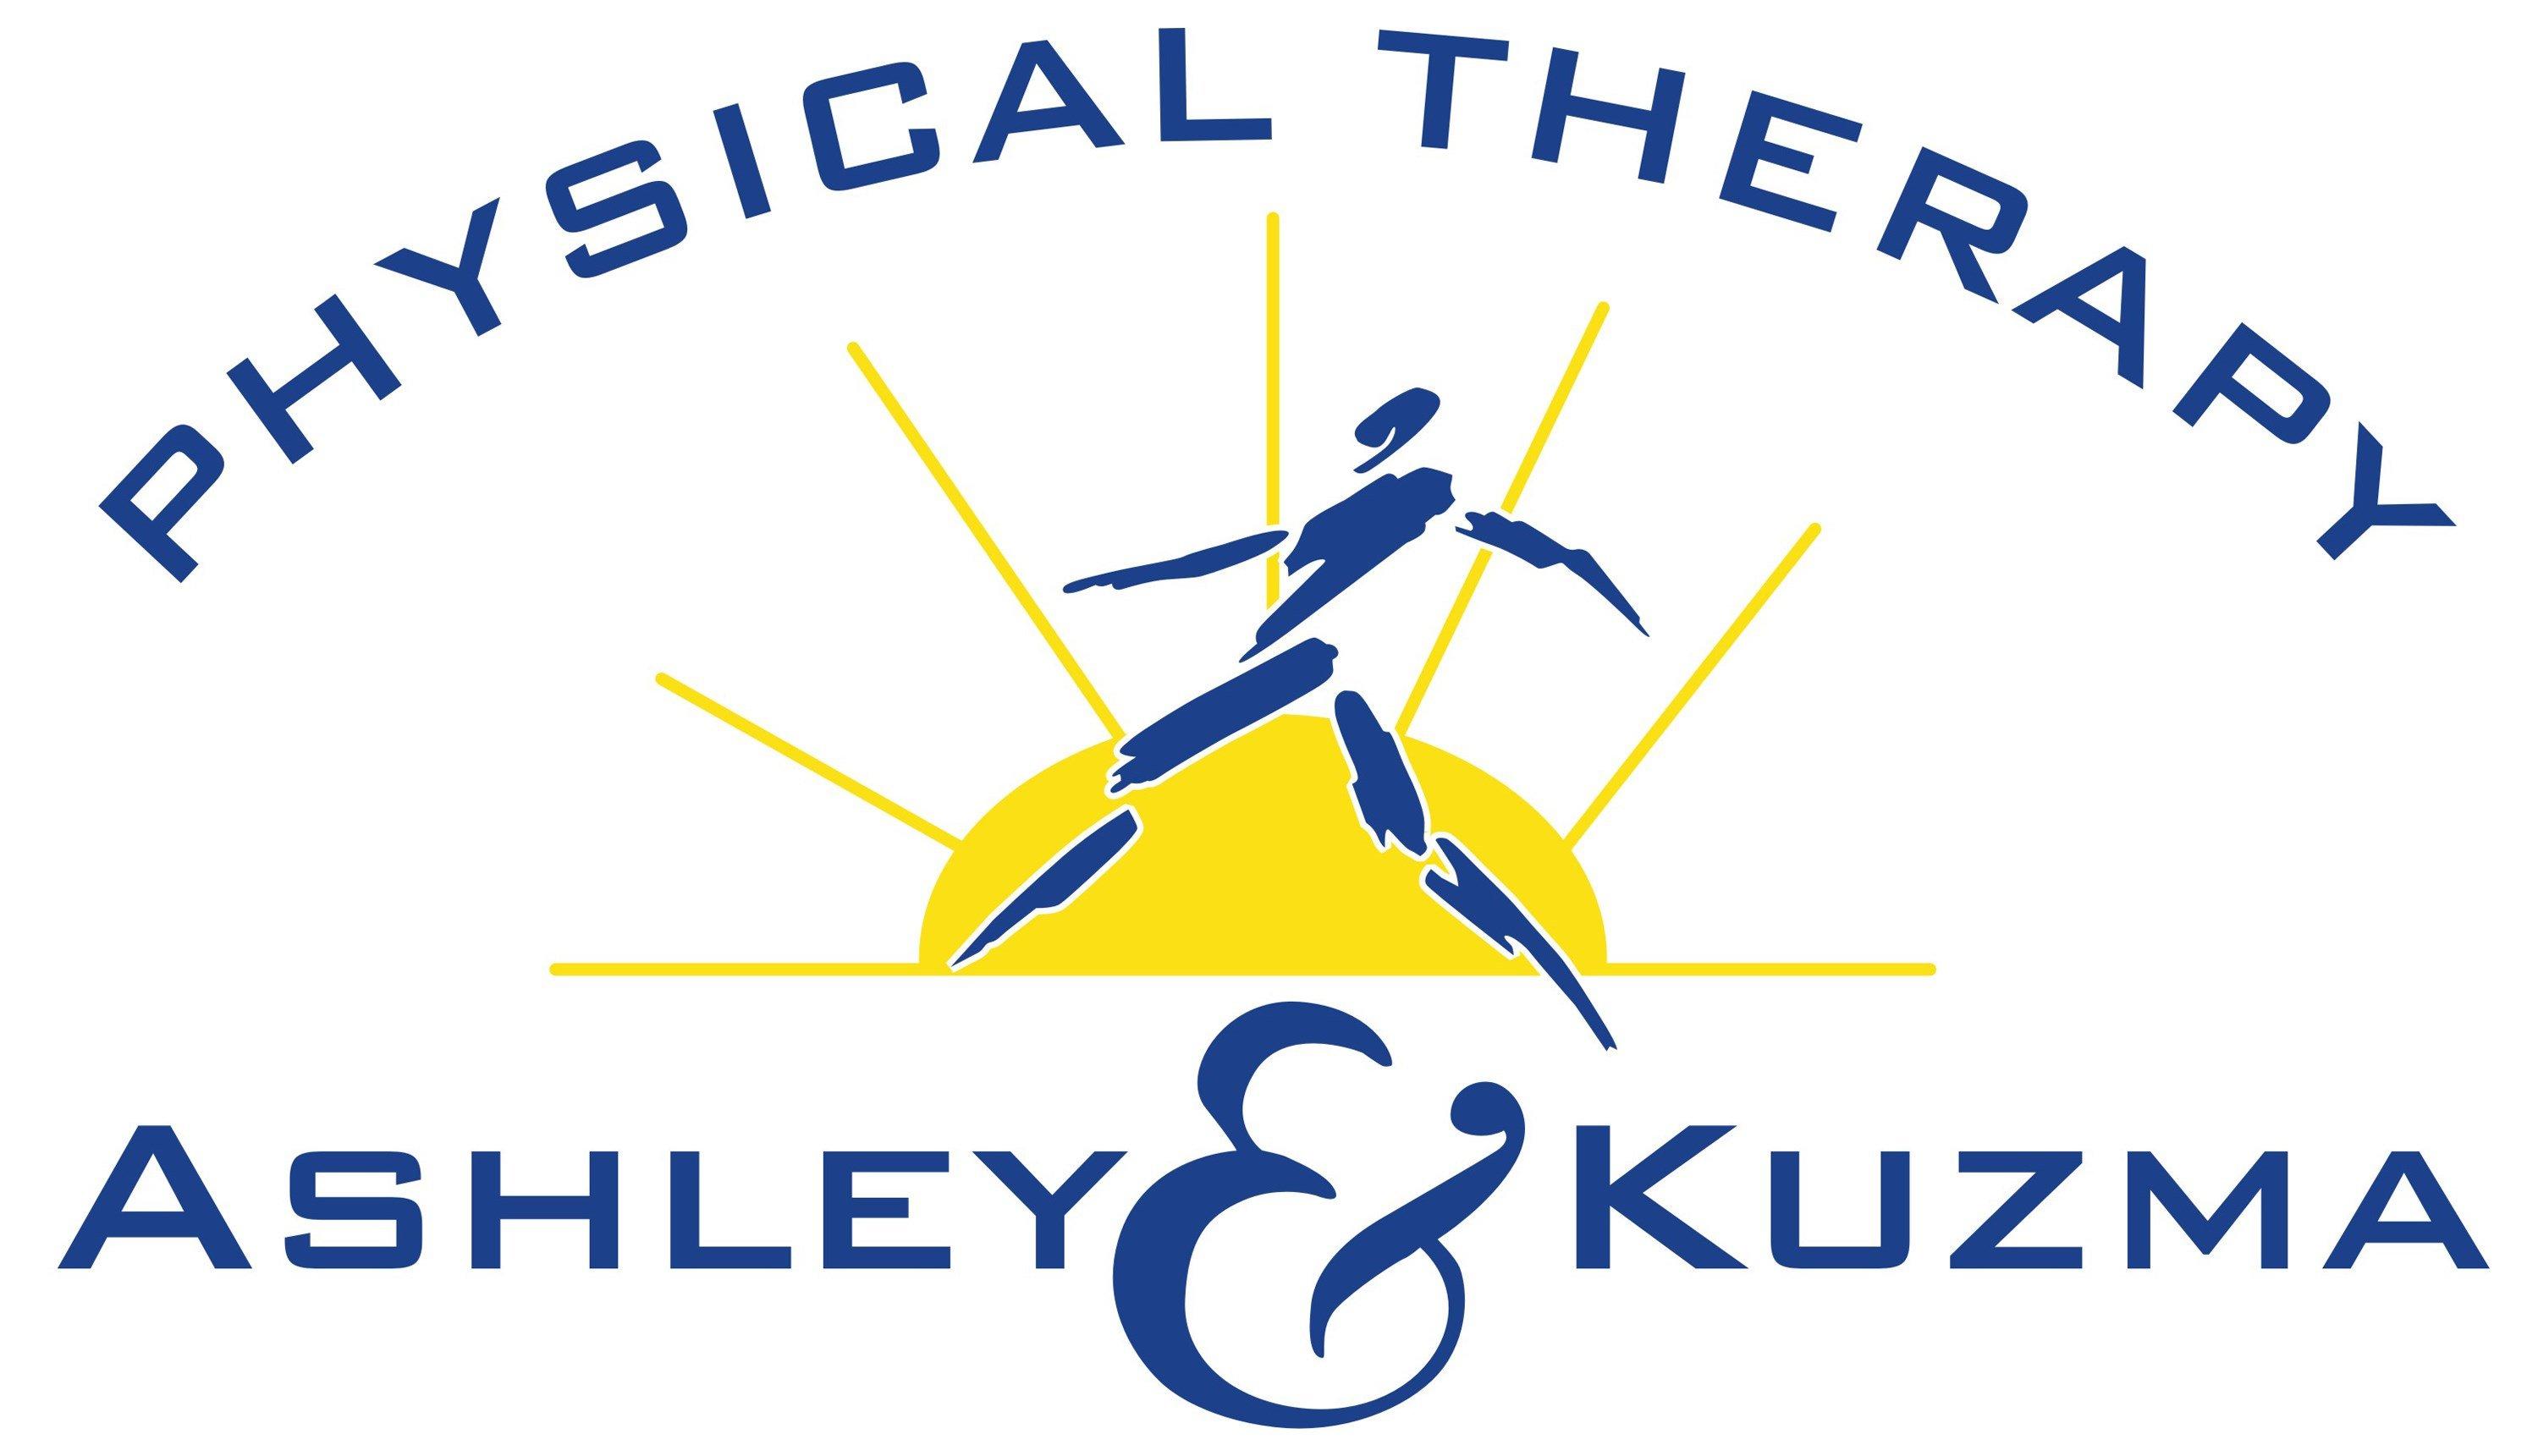 Ashley & Kuzma Physical Therapy